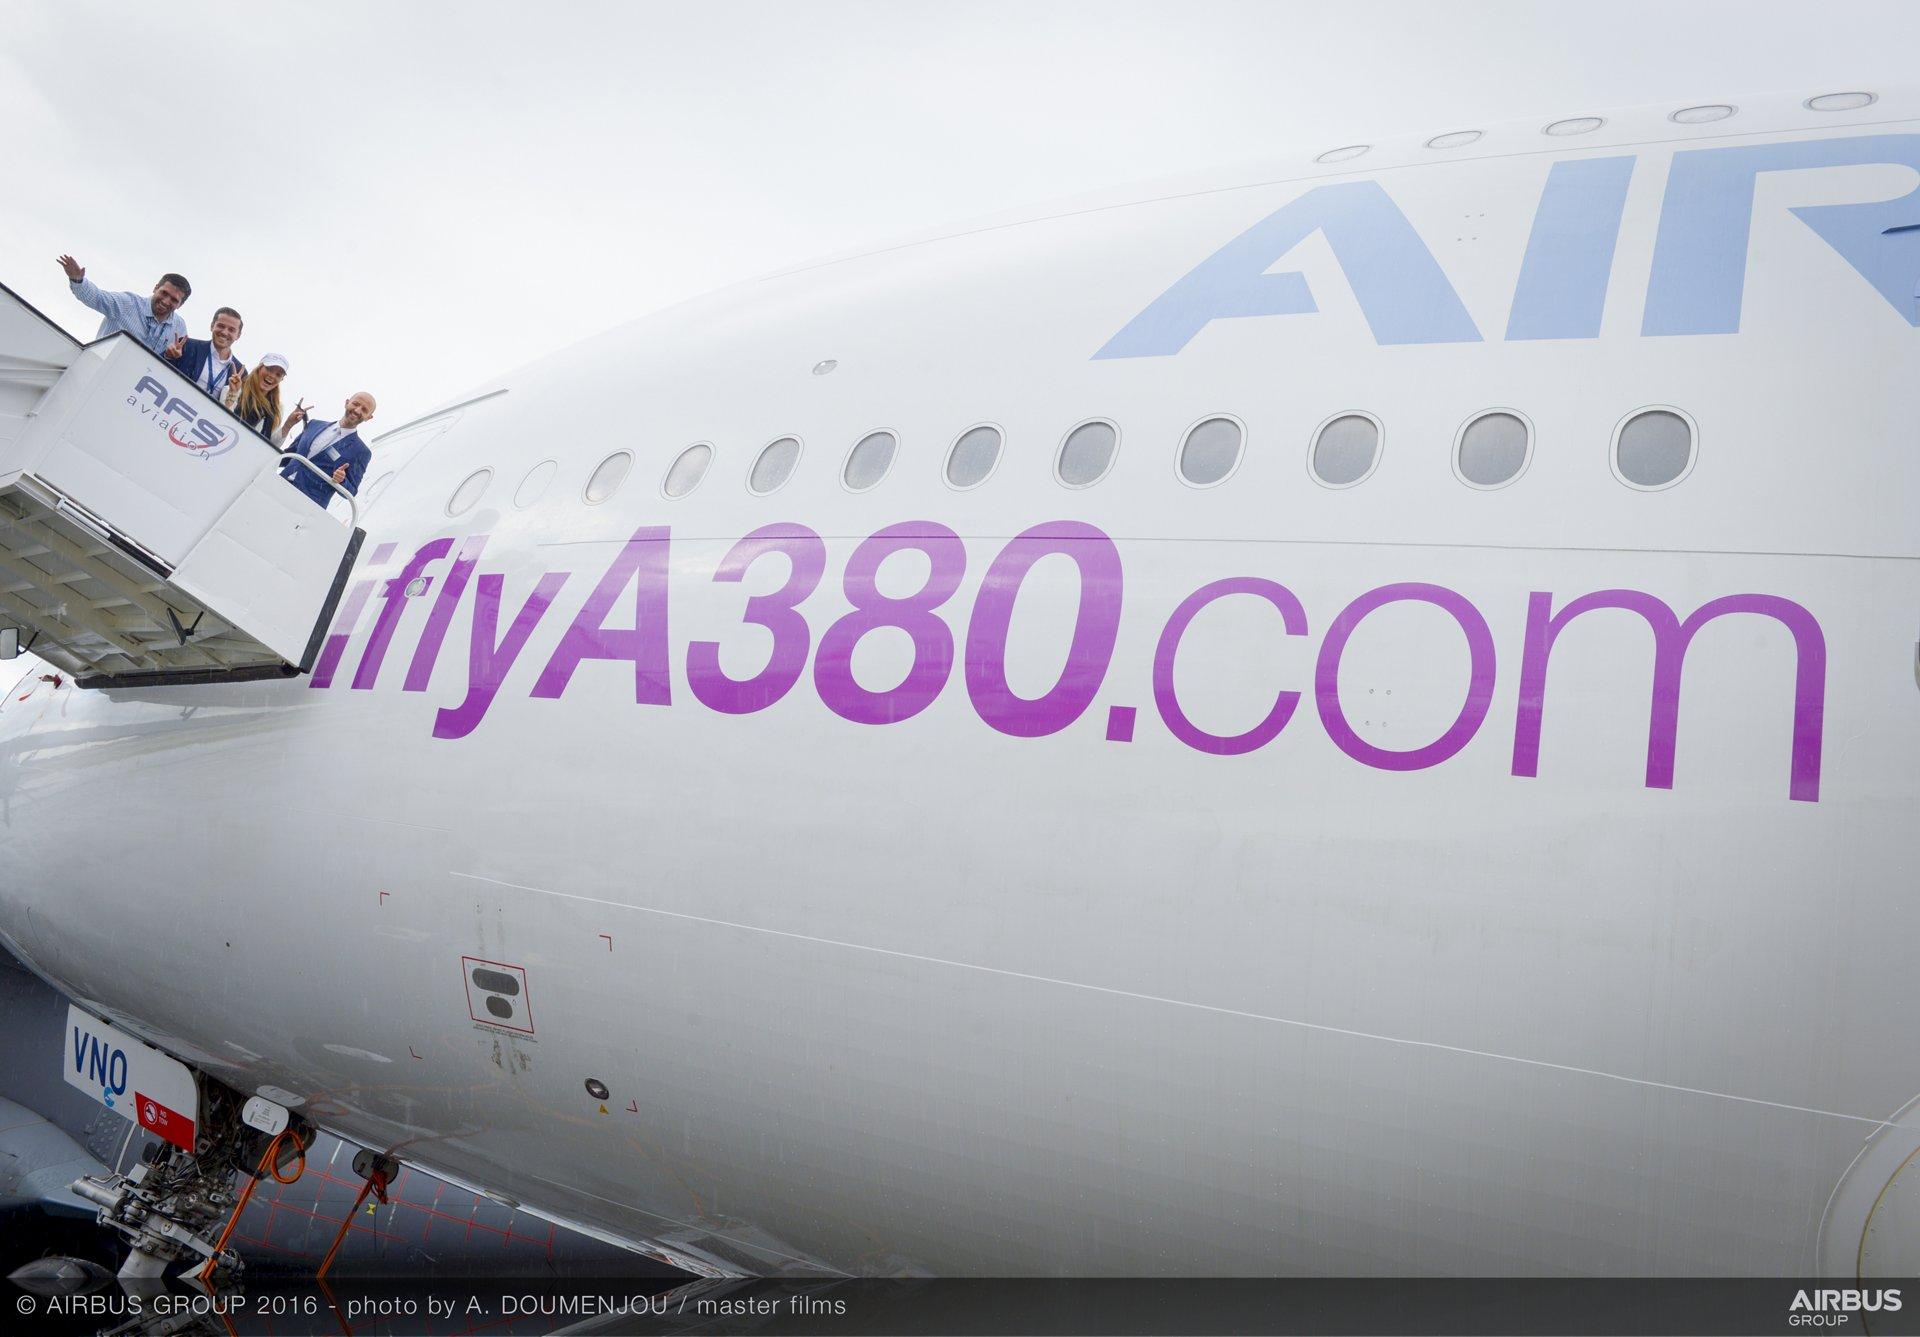 Farnborough Airshow_Day 4_I Fly A380 3